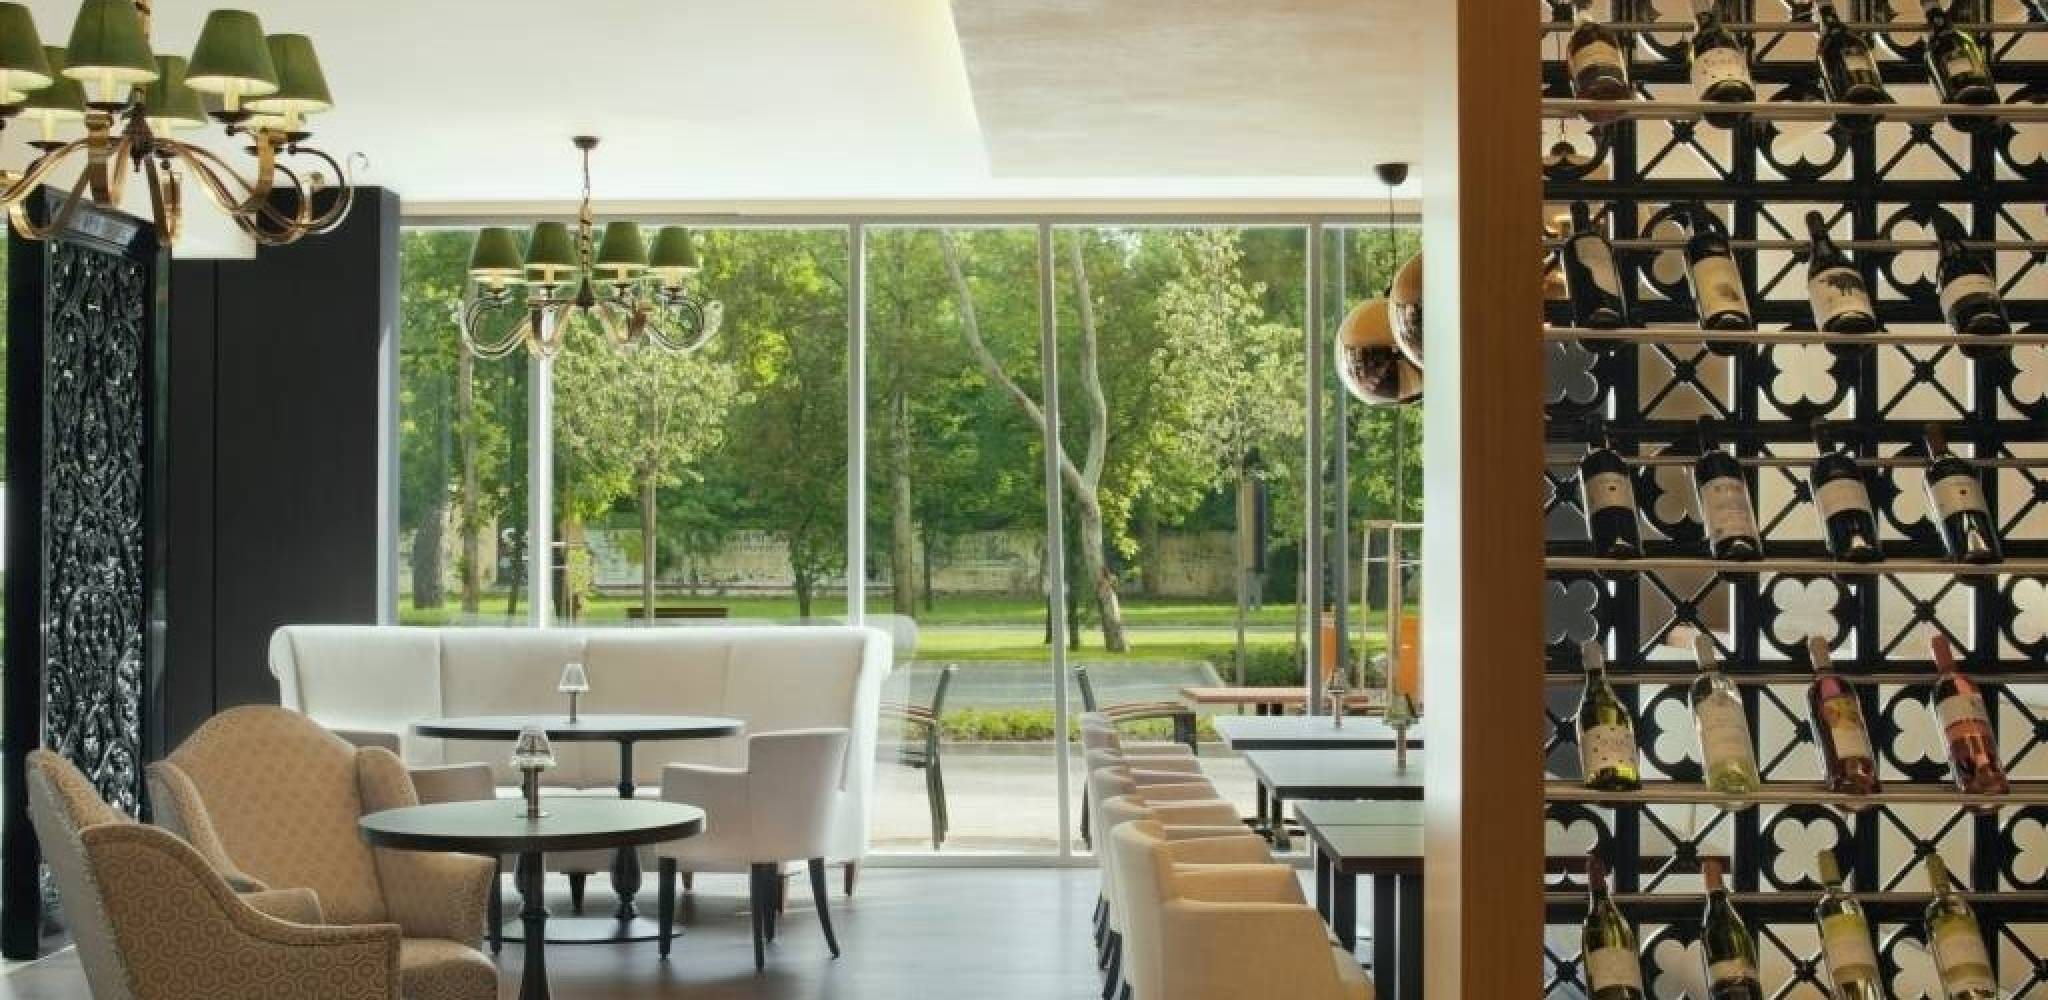 Four Points by Sheraton Kecskemét Hotel és Konferenciaközpont - Bistorant